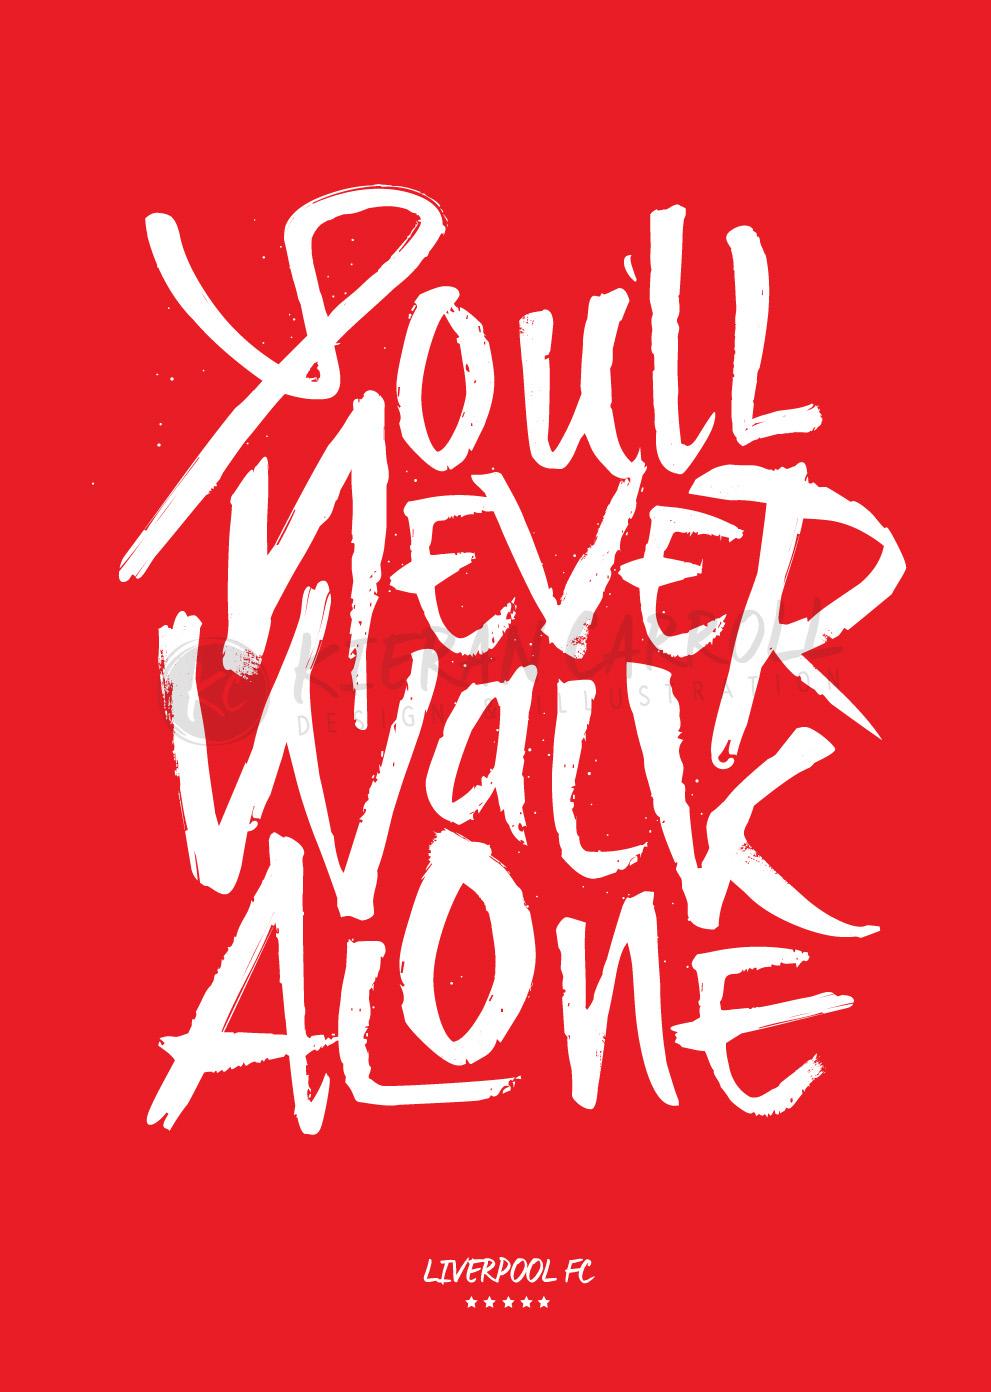 You Ll Never Walk Alone | FLI